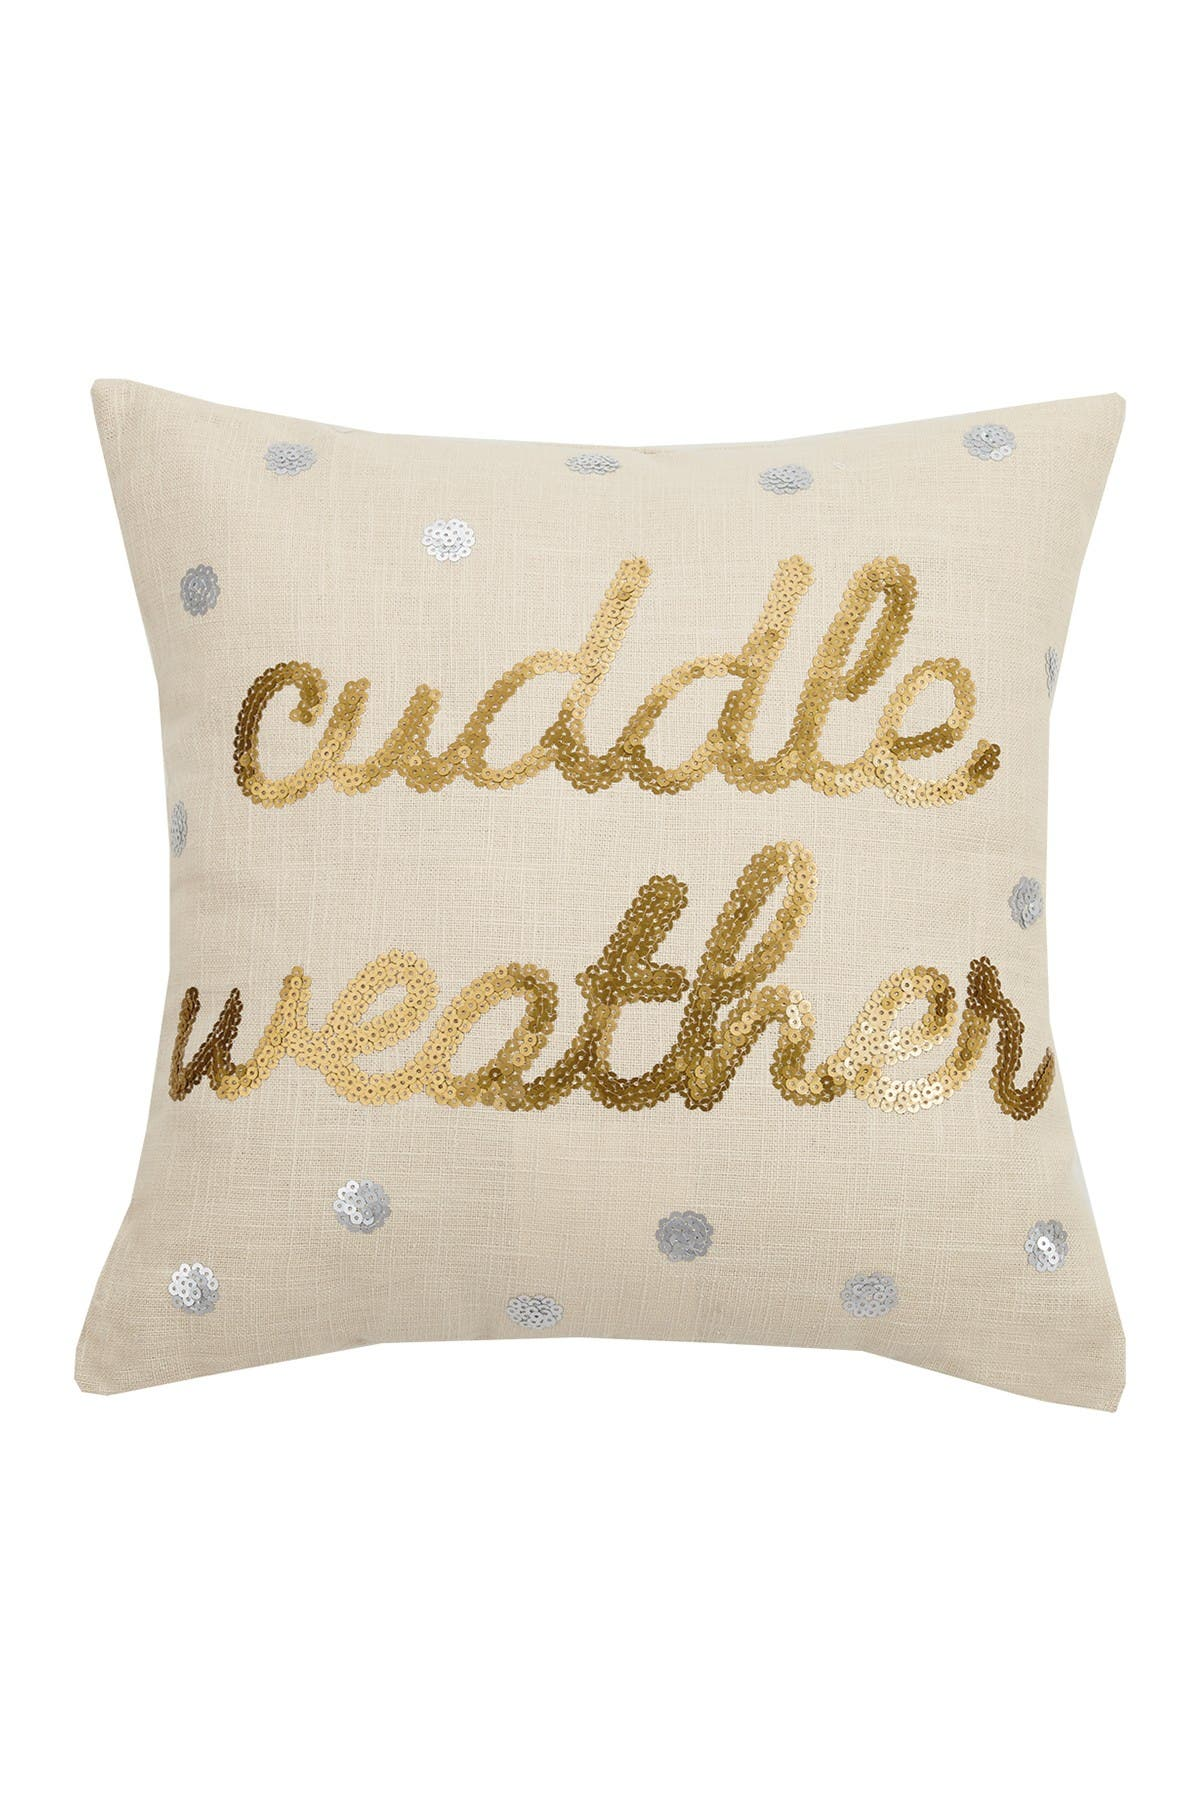 Image of Peking Handicraft Gold/Cream Cuddle Sequins Pillow